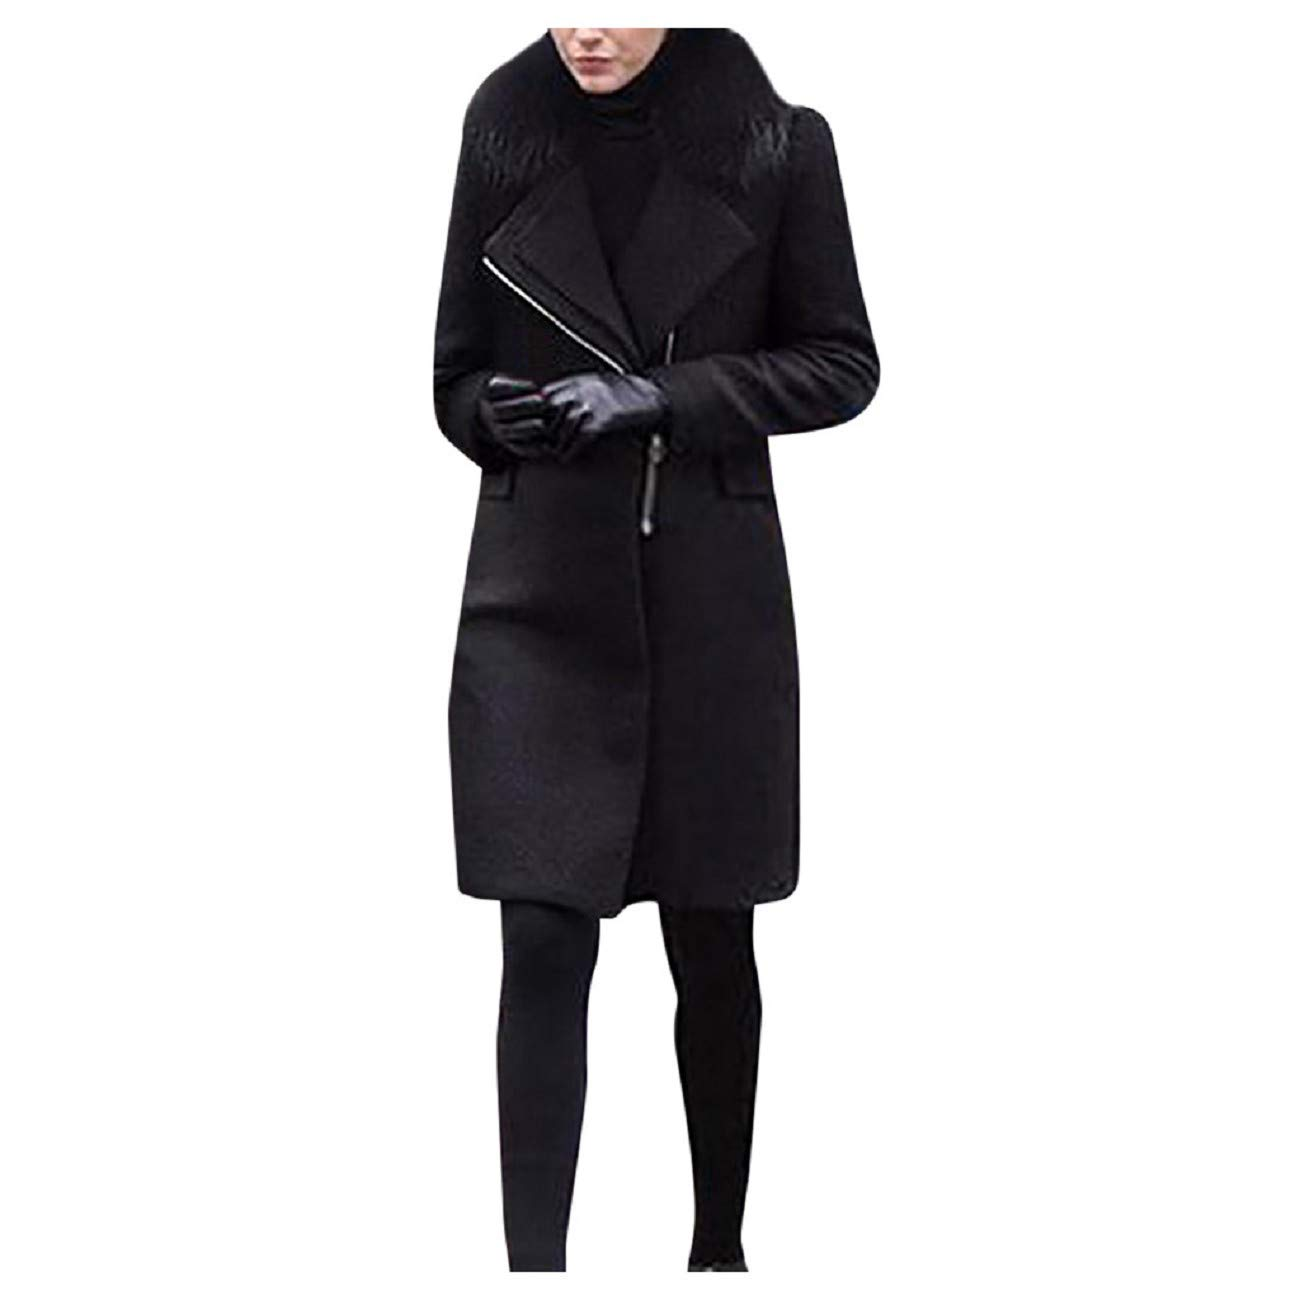 Reokoou Winter Lapel Faxu Wool Coat for Women Fur Collar Long Sleeve Trench Jacket Big Pocket Outwear Zipper Solid Tops Black by Reokoou